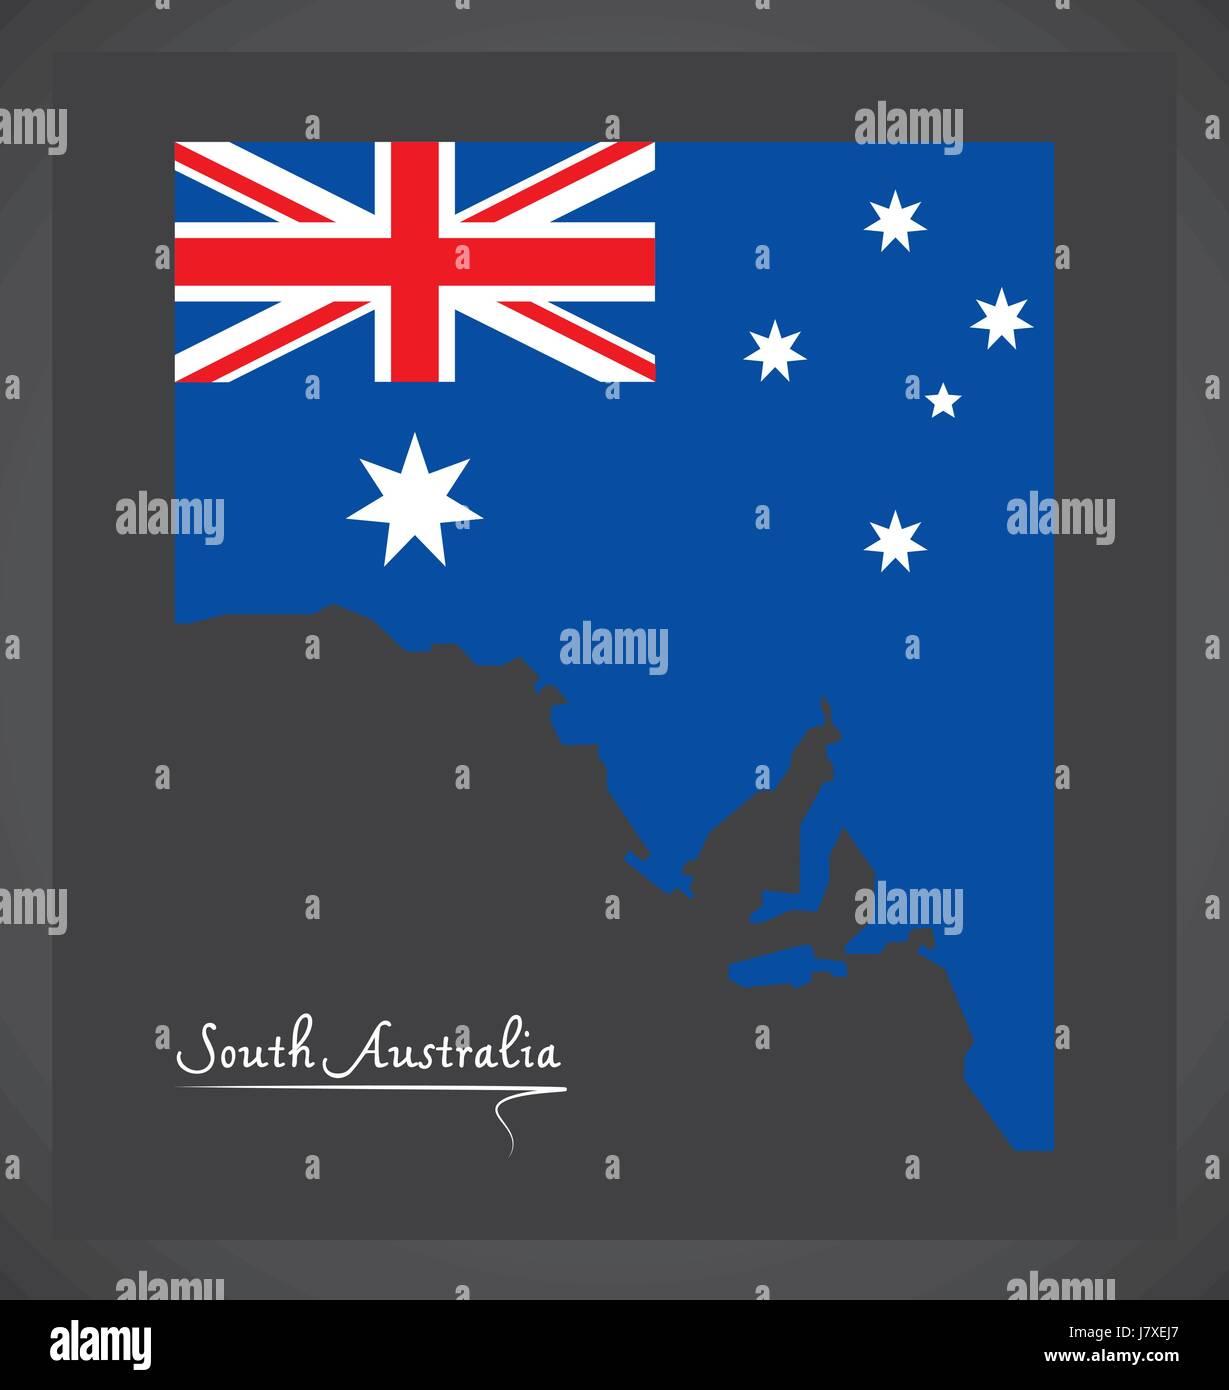 South Australia map with Australian national flag illustration - Stock Image